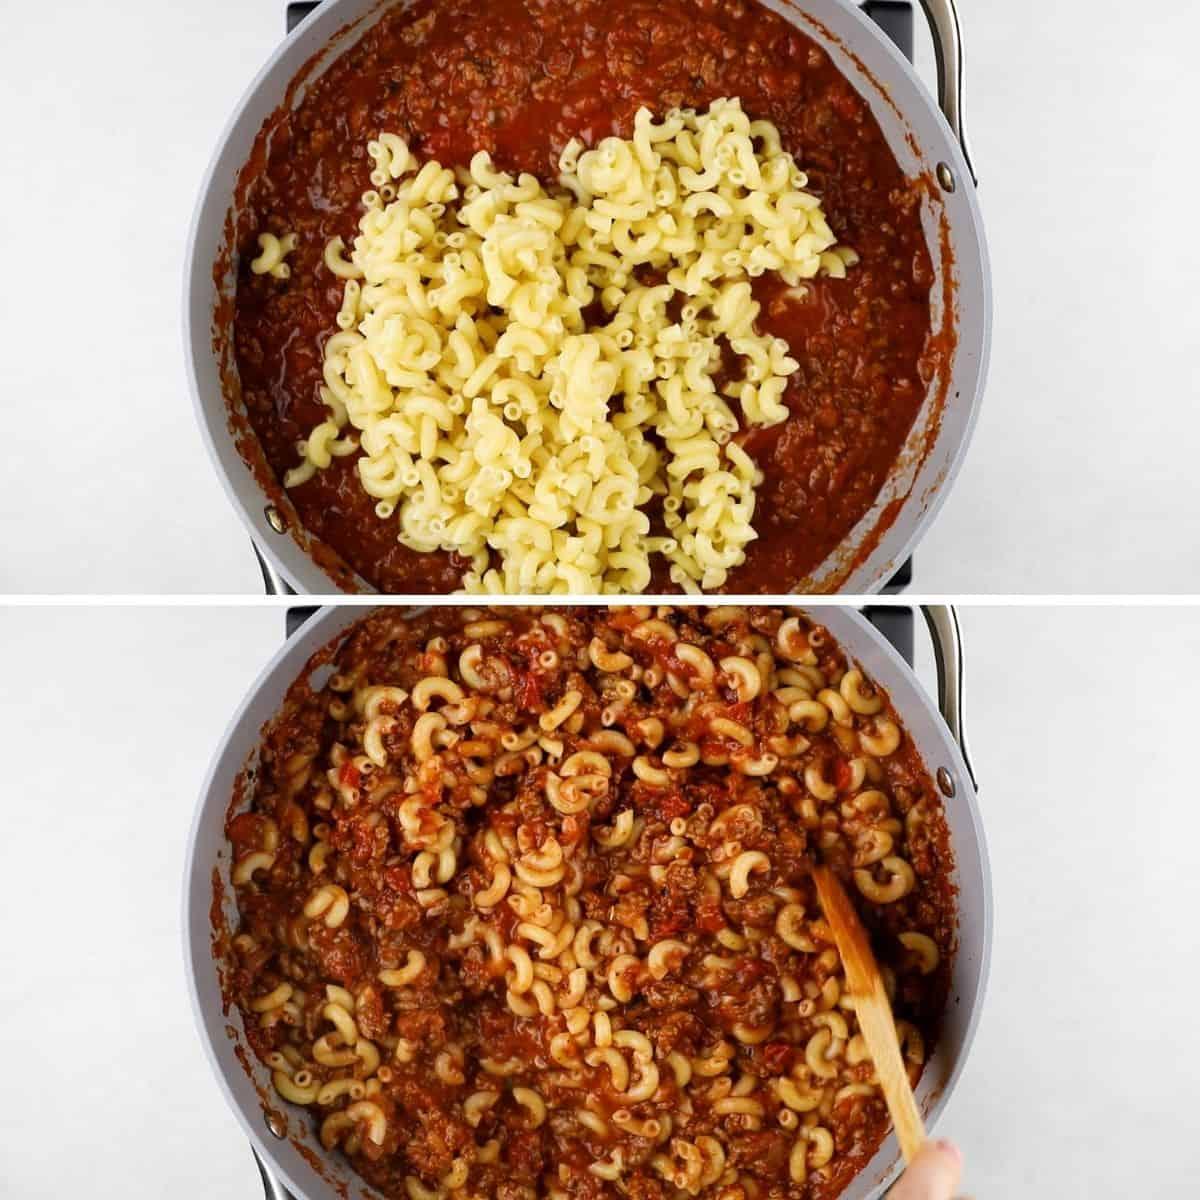 Process photos of adding elbow pasta to goulash.